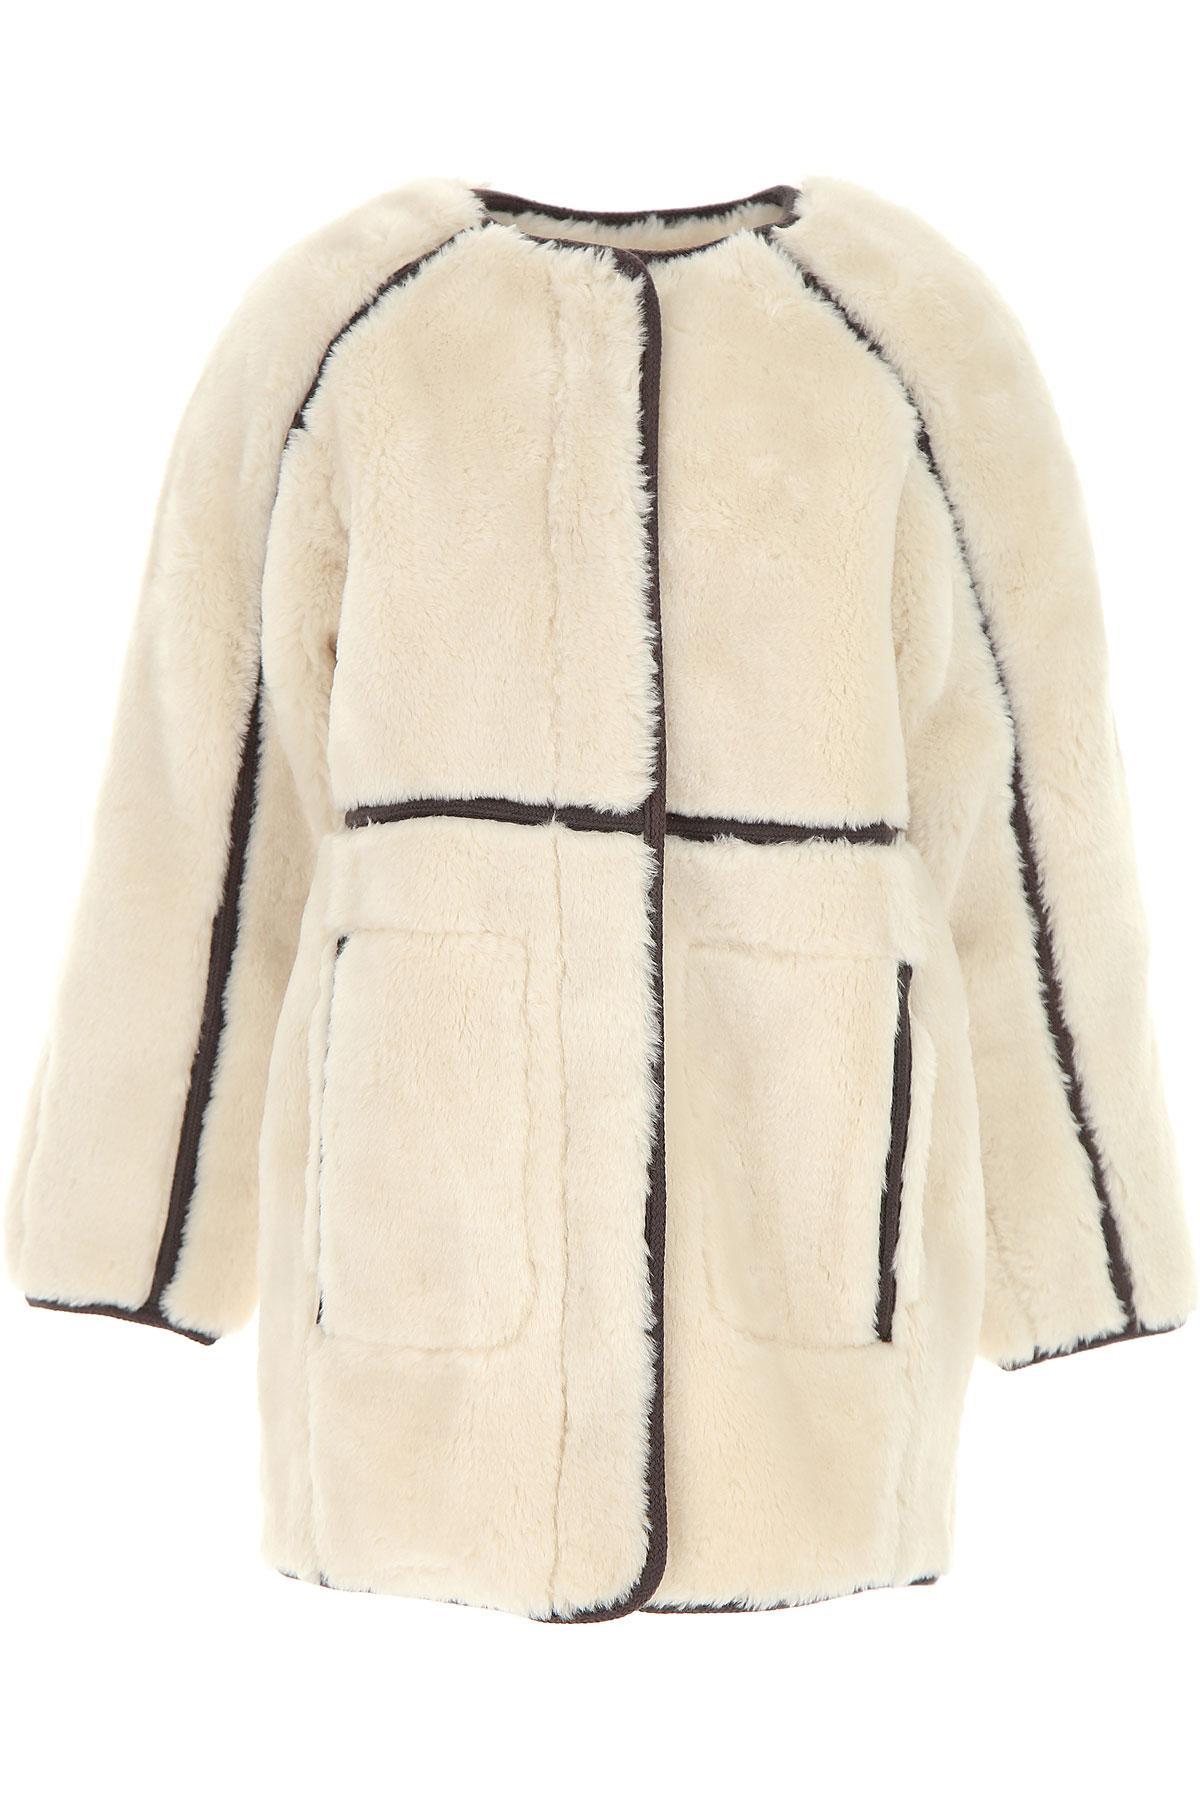 Image of Chloe {DESIGNER} Kids Coat for Girls, Ivory, polyester, 2017, 10Y 14Y 4Y 5Y 6Y 8Y